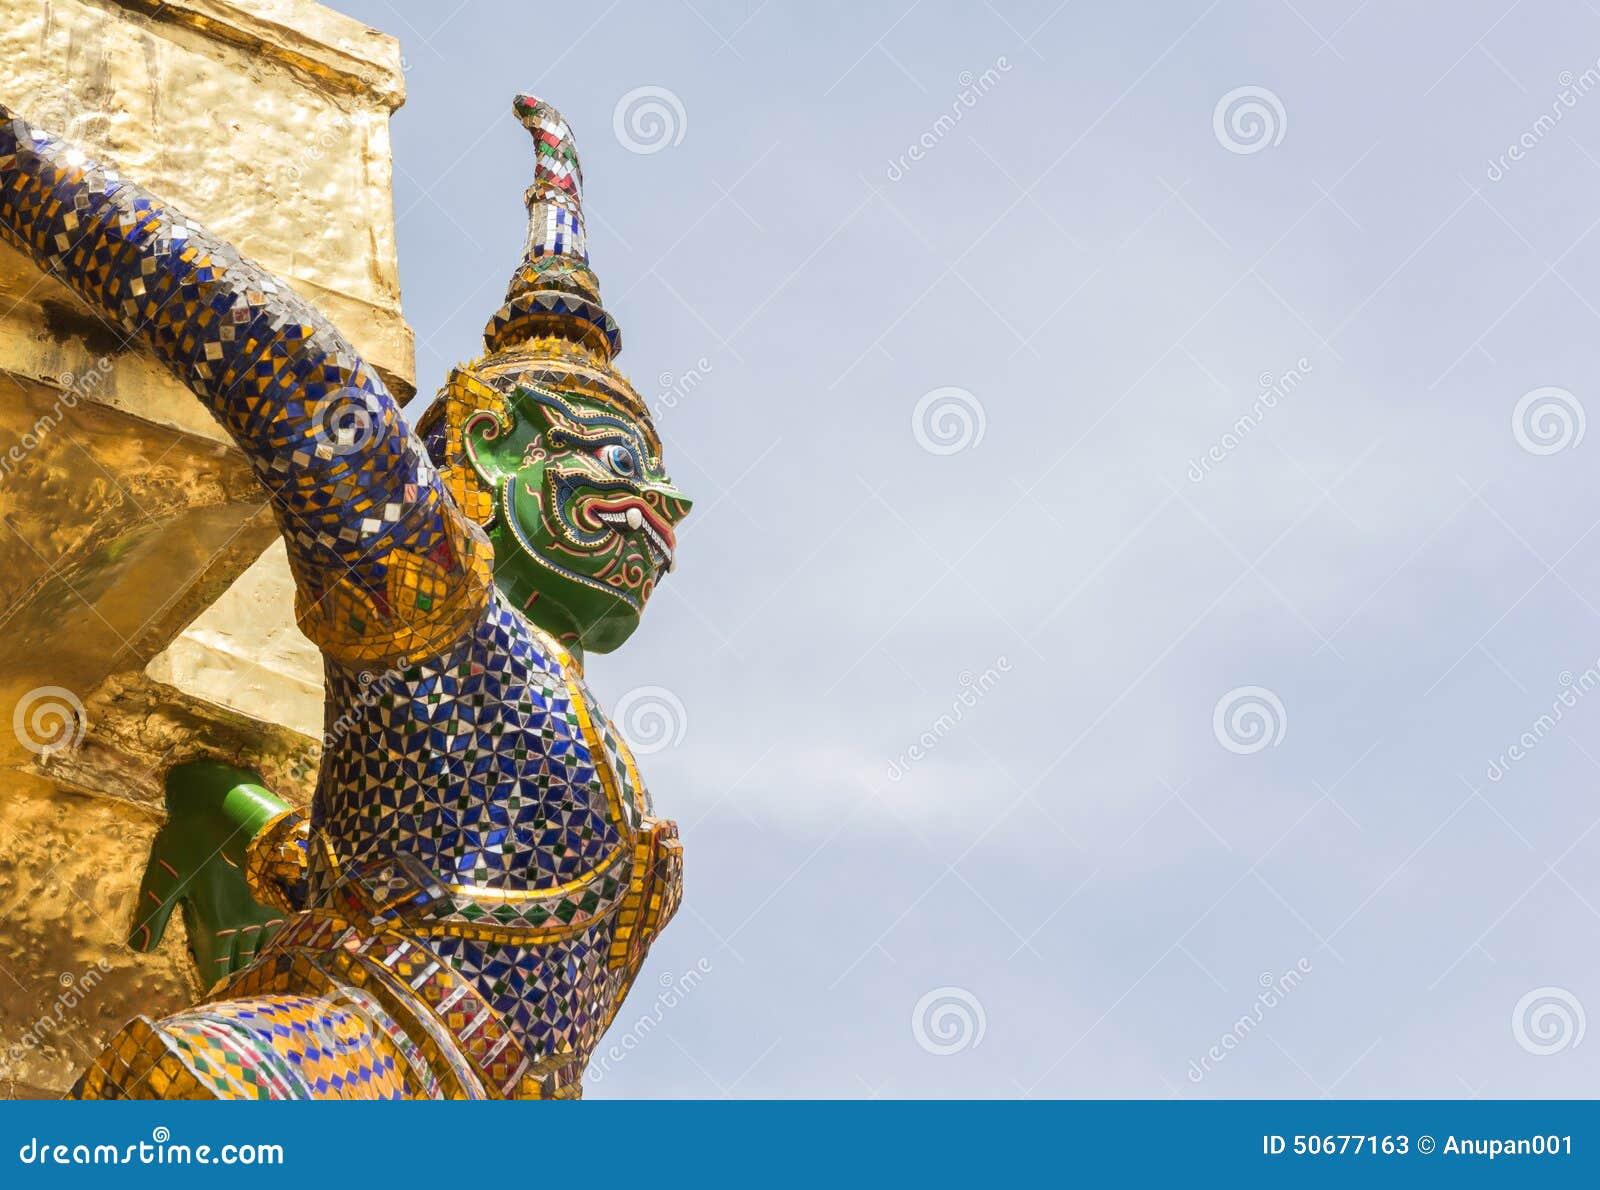 Download 在Wat Pra Kaew,曼谷泰国的巨人 库存图片. 图片 包括有 纪念碑, 巨型, 顽皮地, 国家, 的btu - 50677163